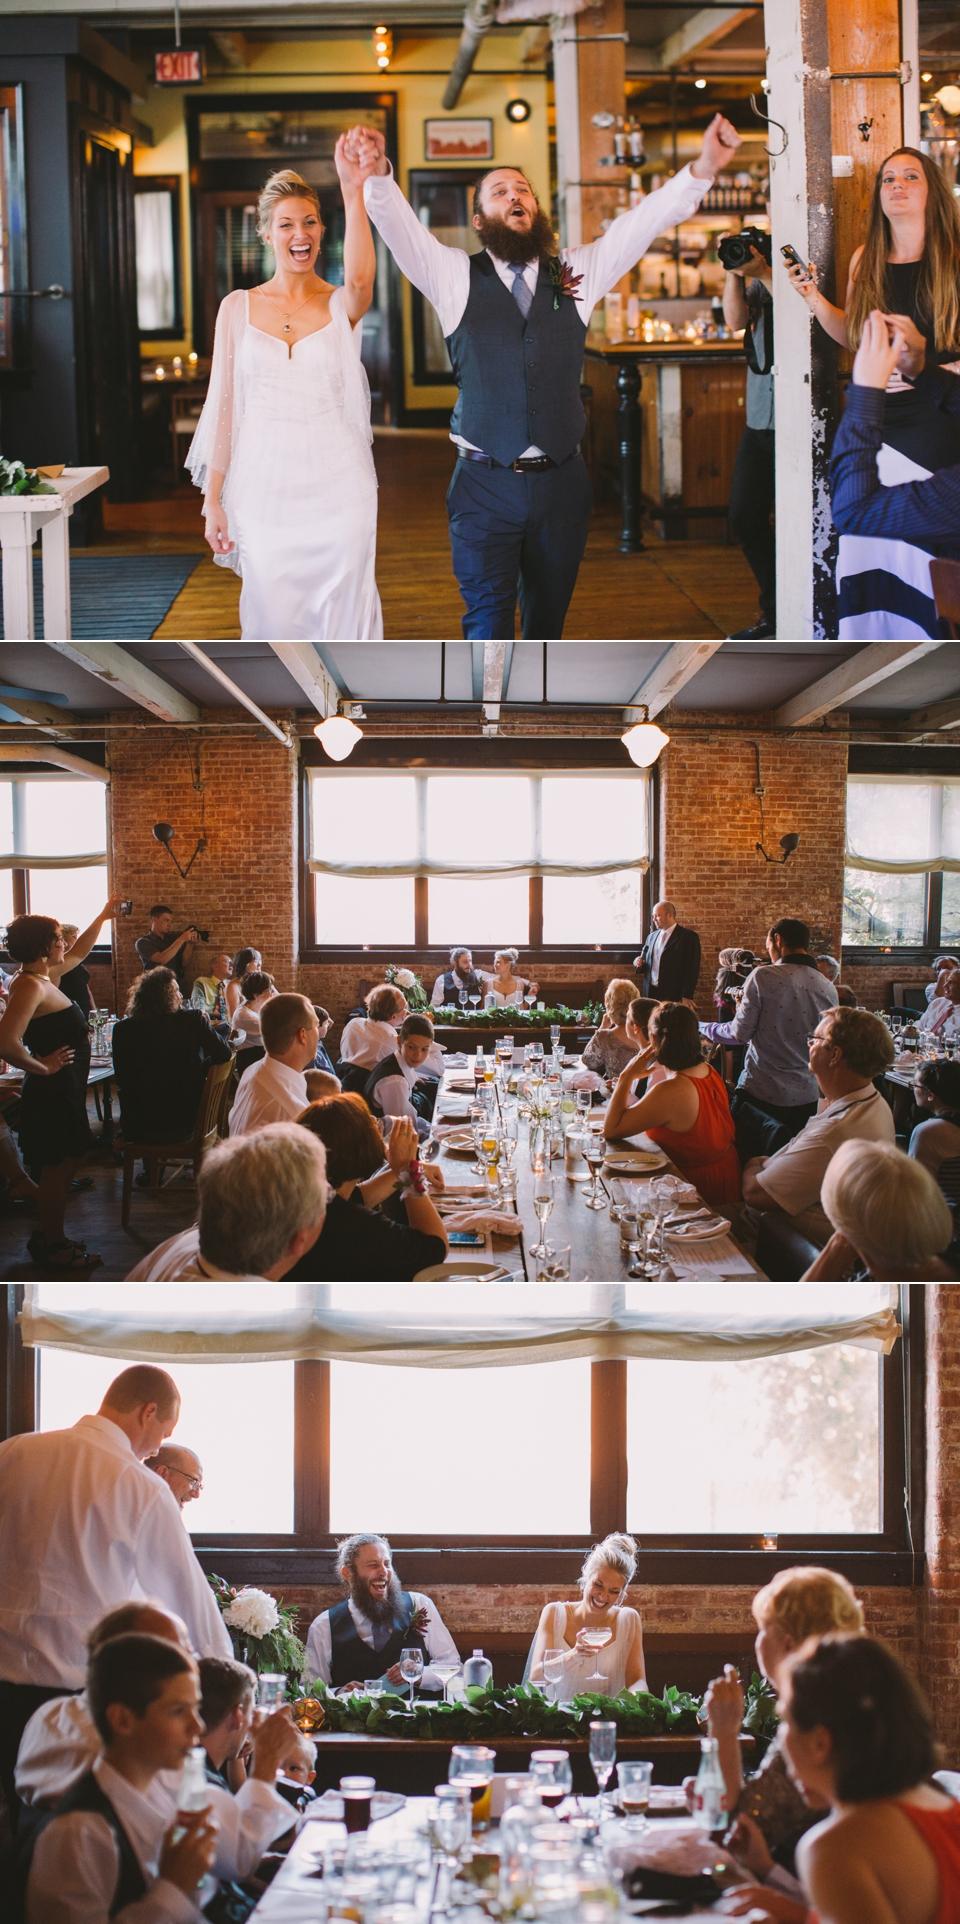 Restaurant Good Luck Wedding Reception